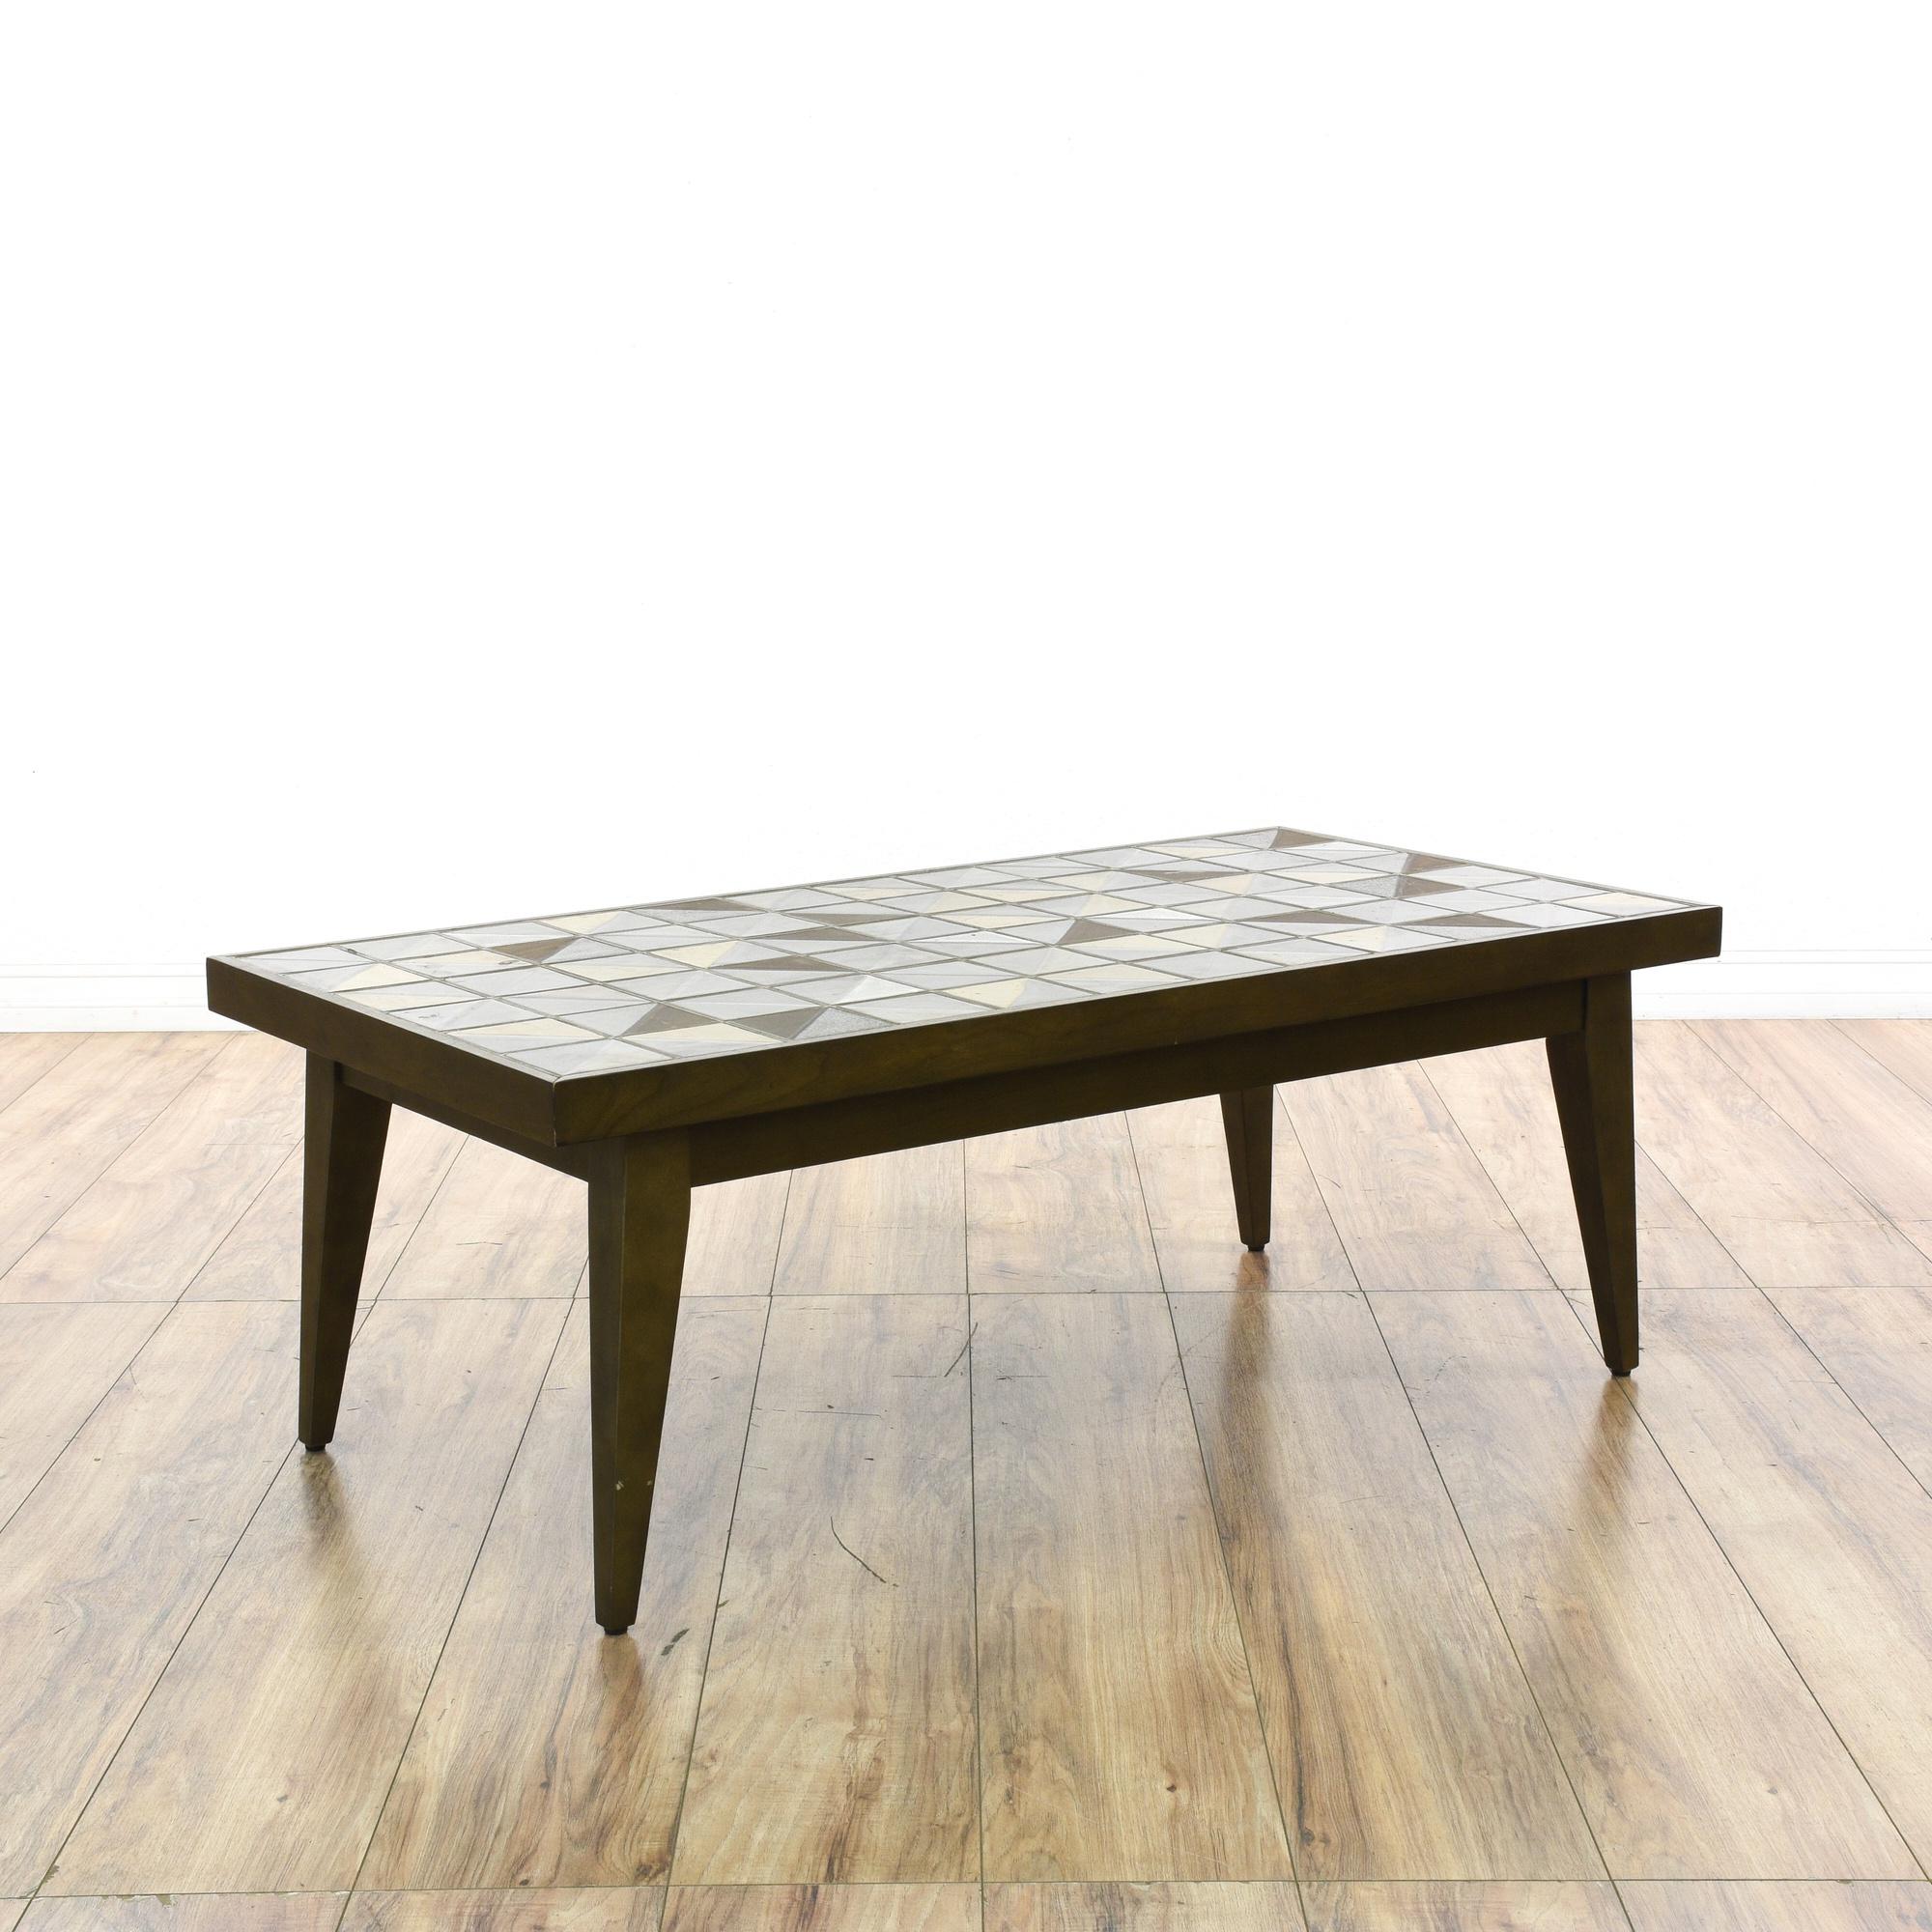 "Mid Century Tile Top Coffee Table: ""West Elm"" Mid Century Style Tile Top Coffee Table"